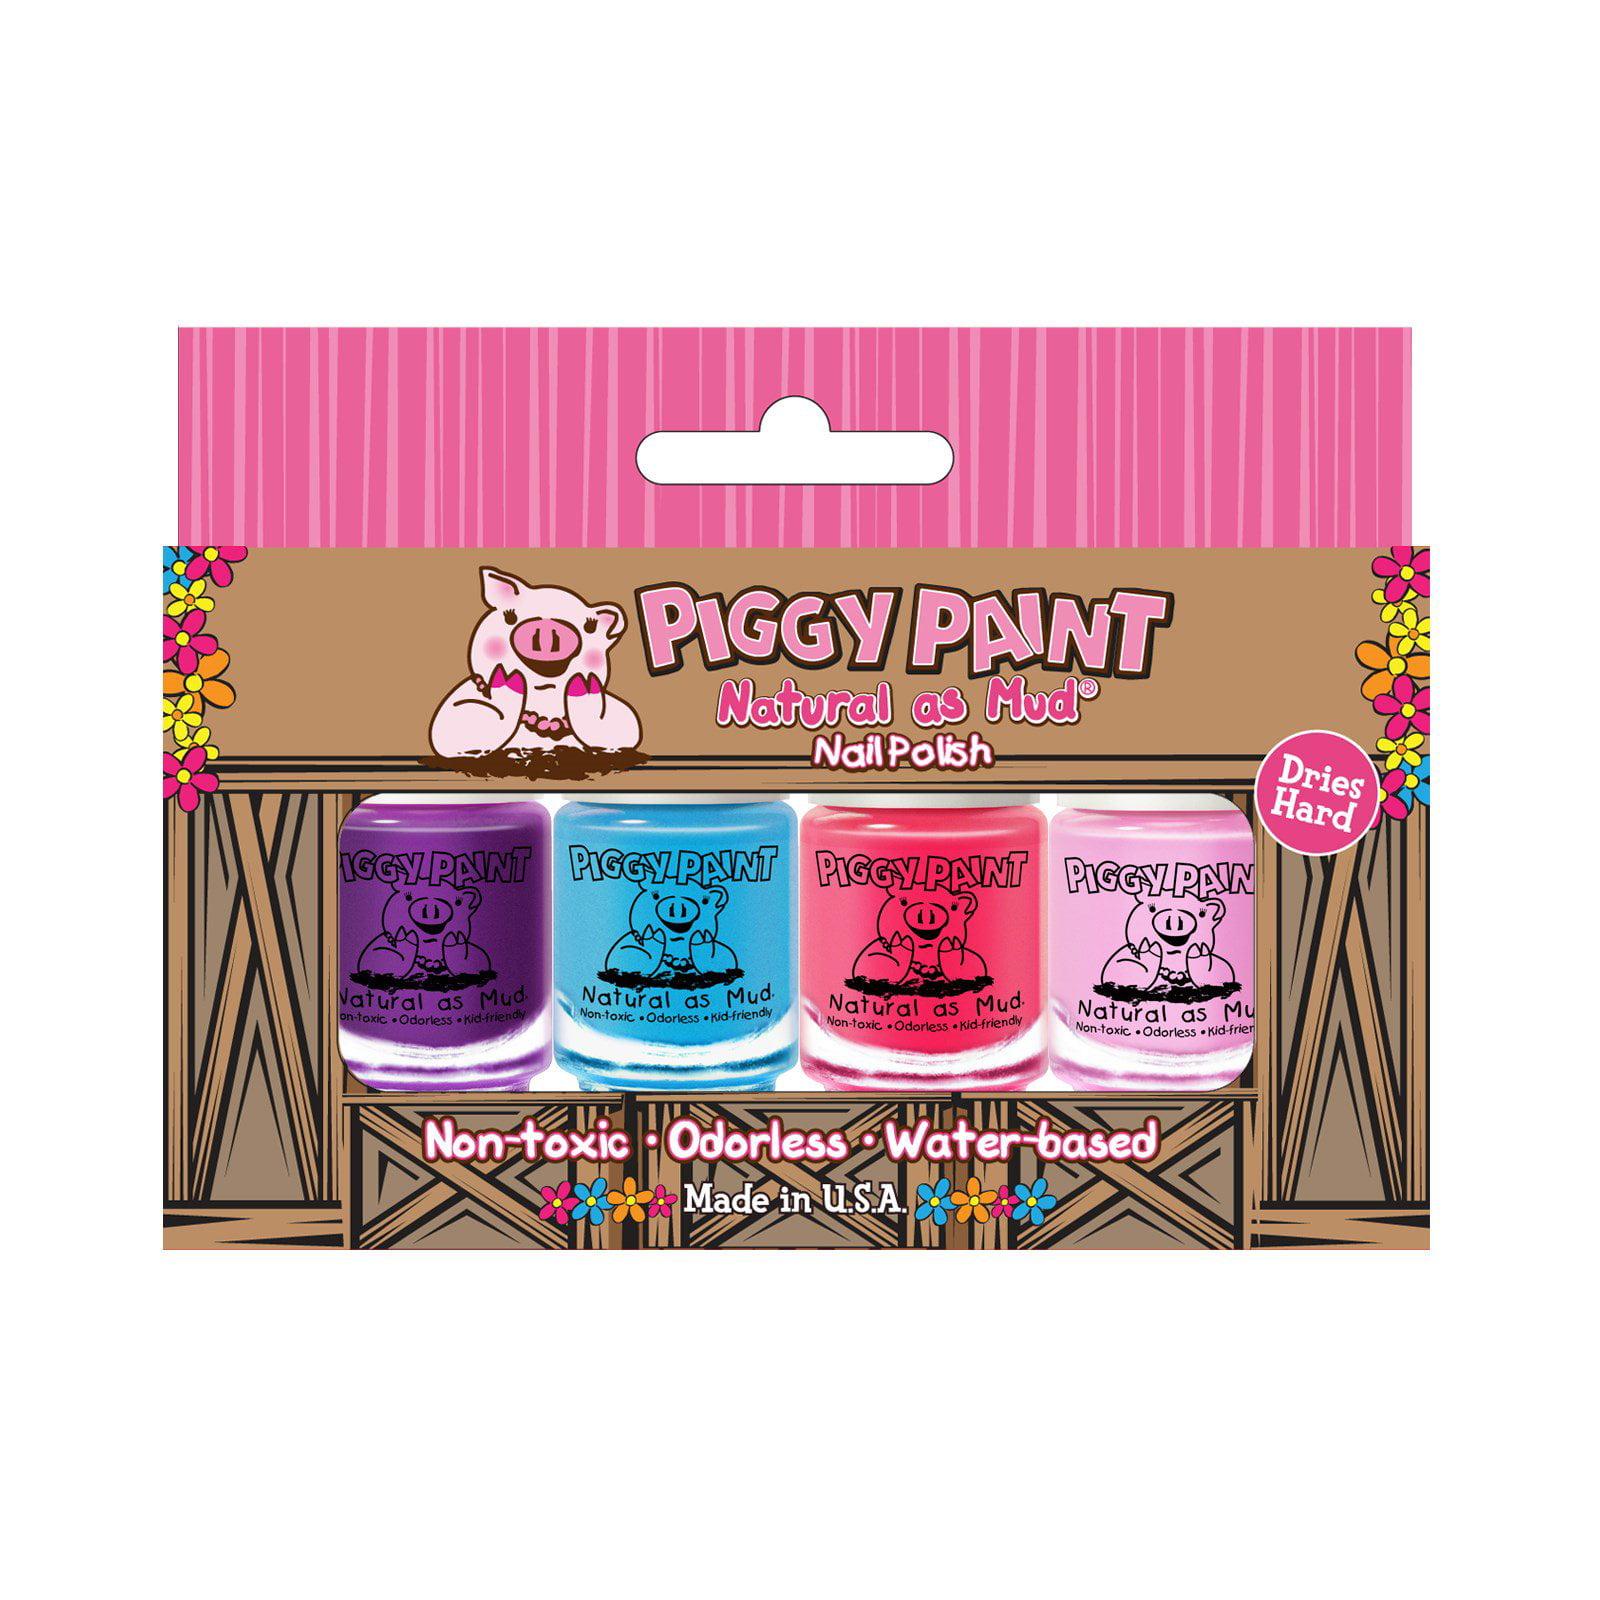 Piggy Paint, Natural as Mud, Nail Polish, 4 Piece Set (3.5 ml) Each(pack of 1)